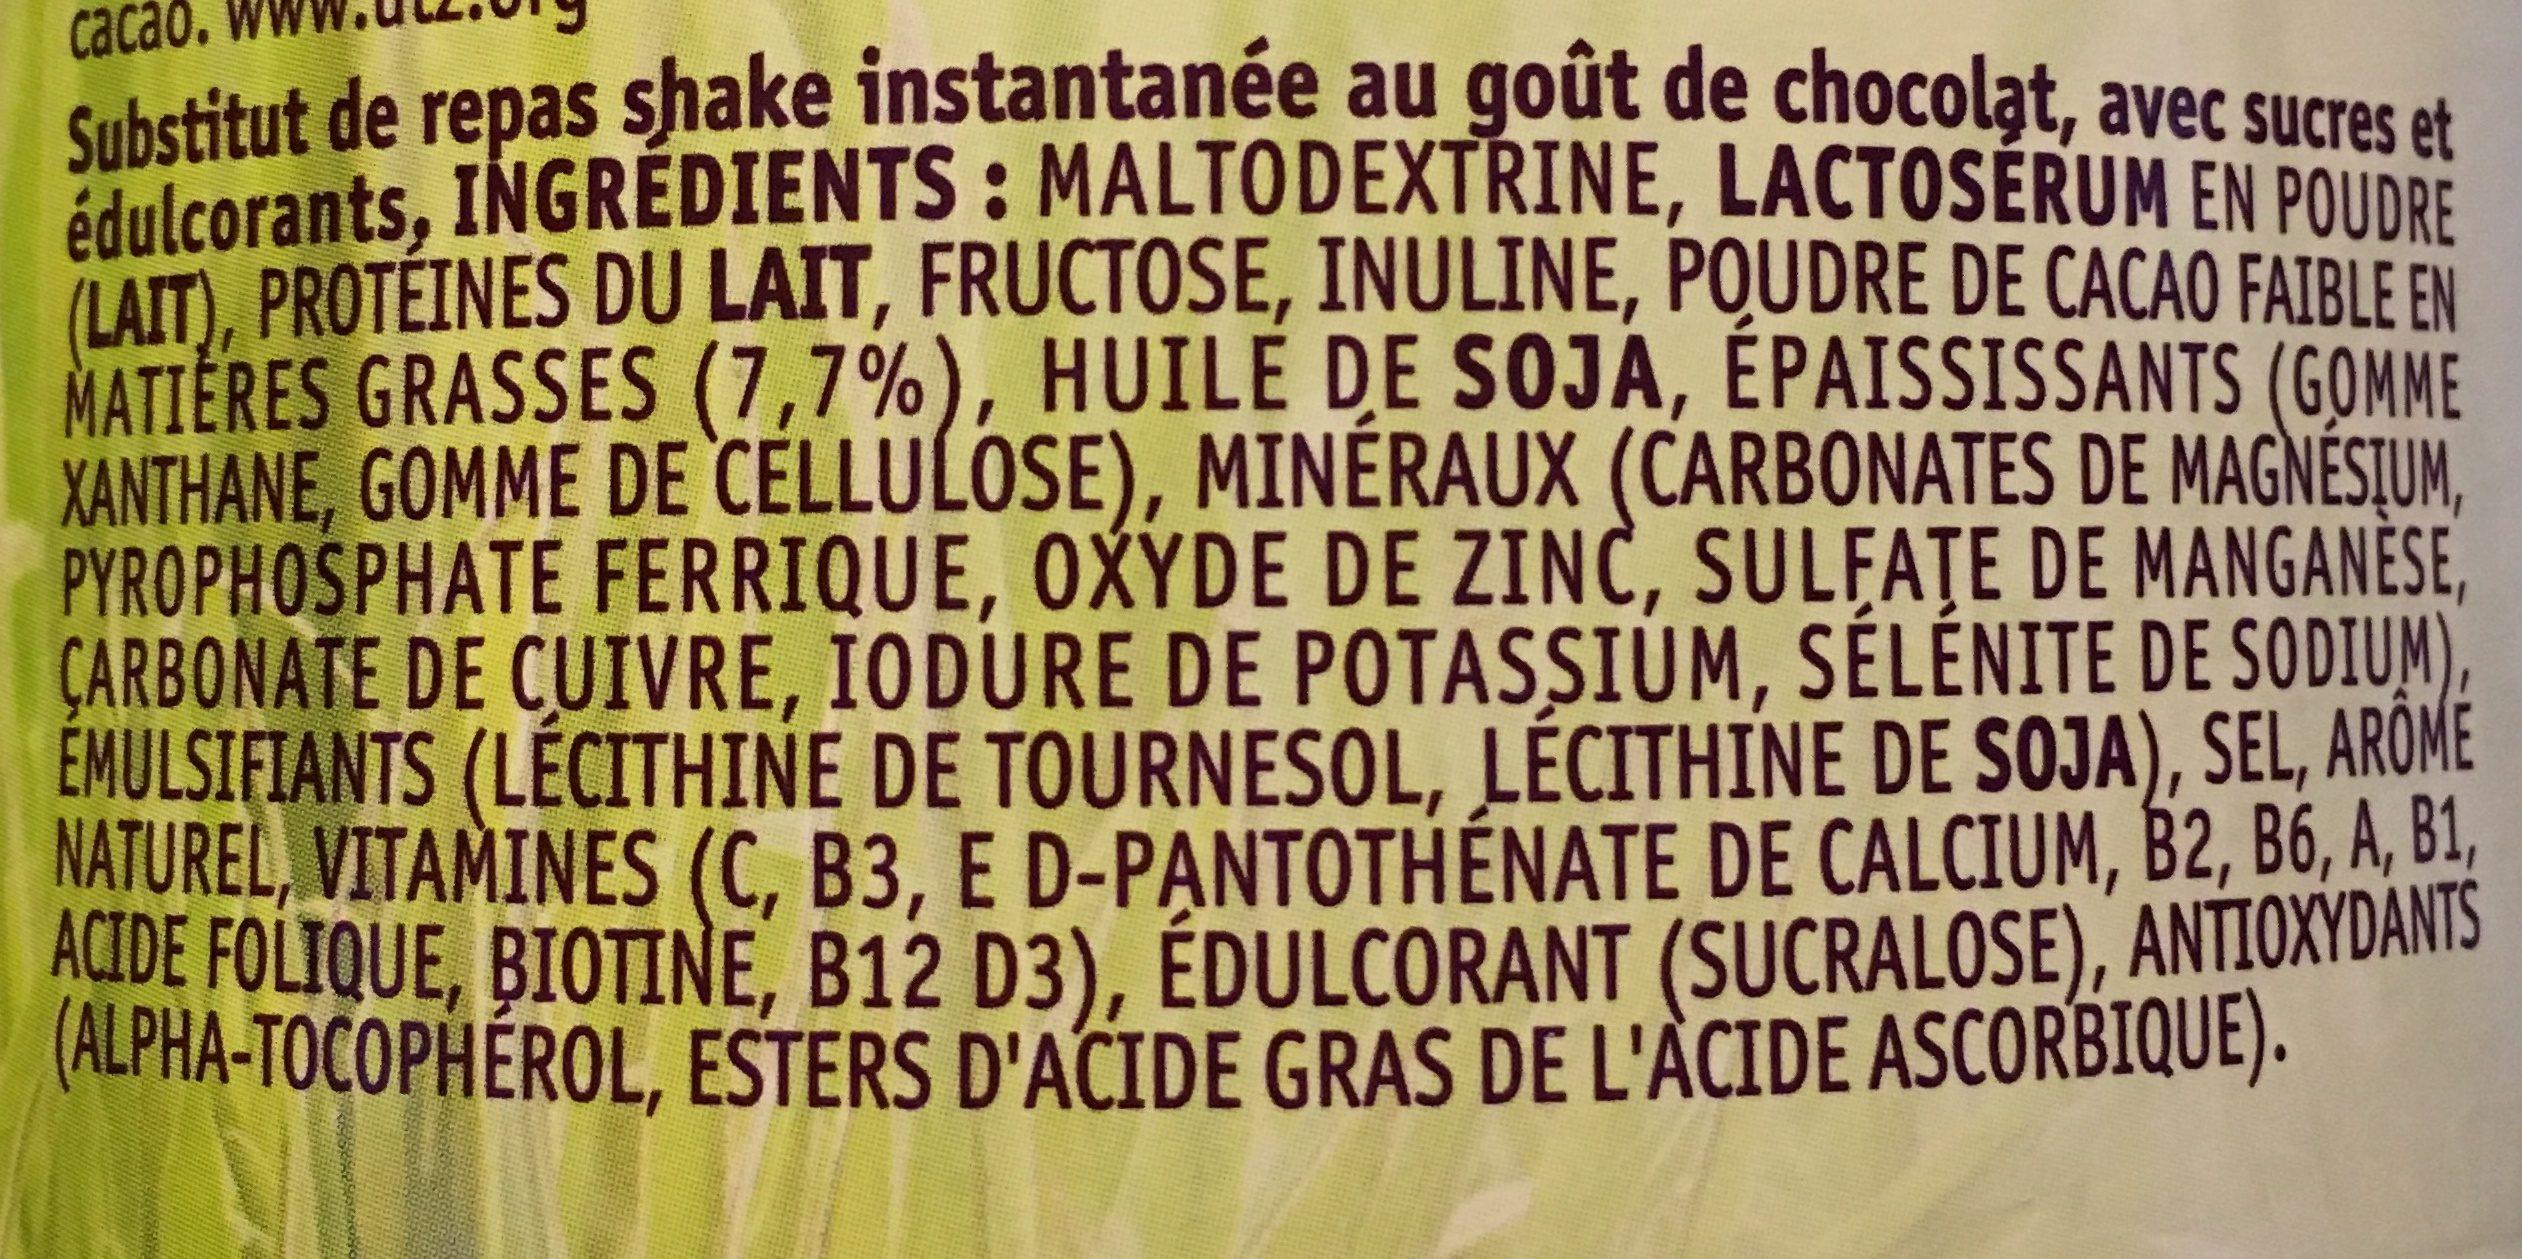 Kruidvat Poids Idéal Repas Shake Chocolat - Ingrédients